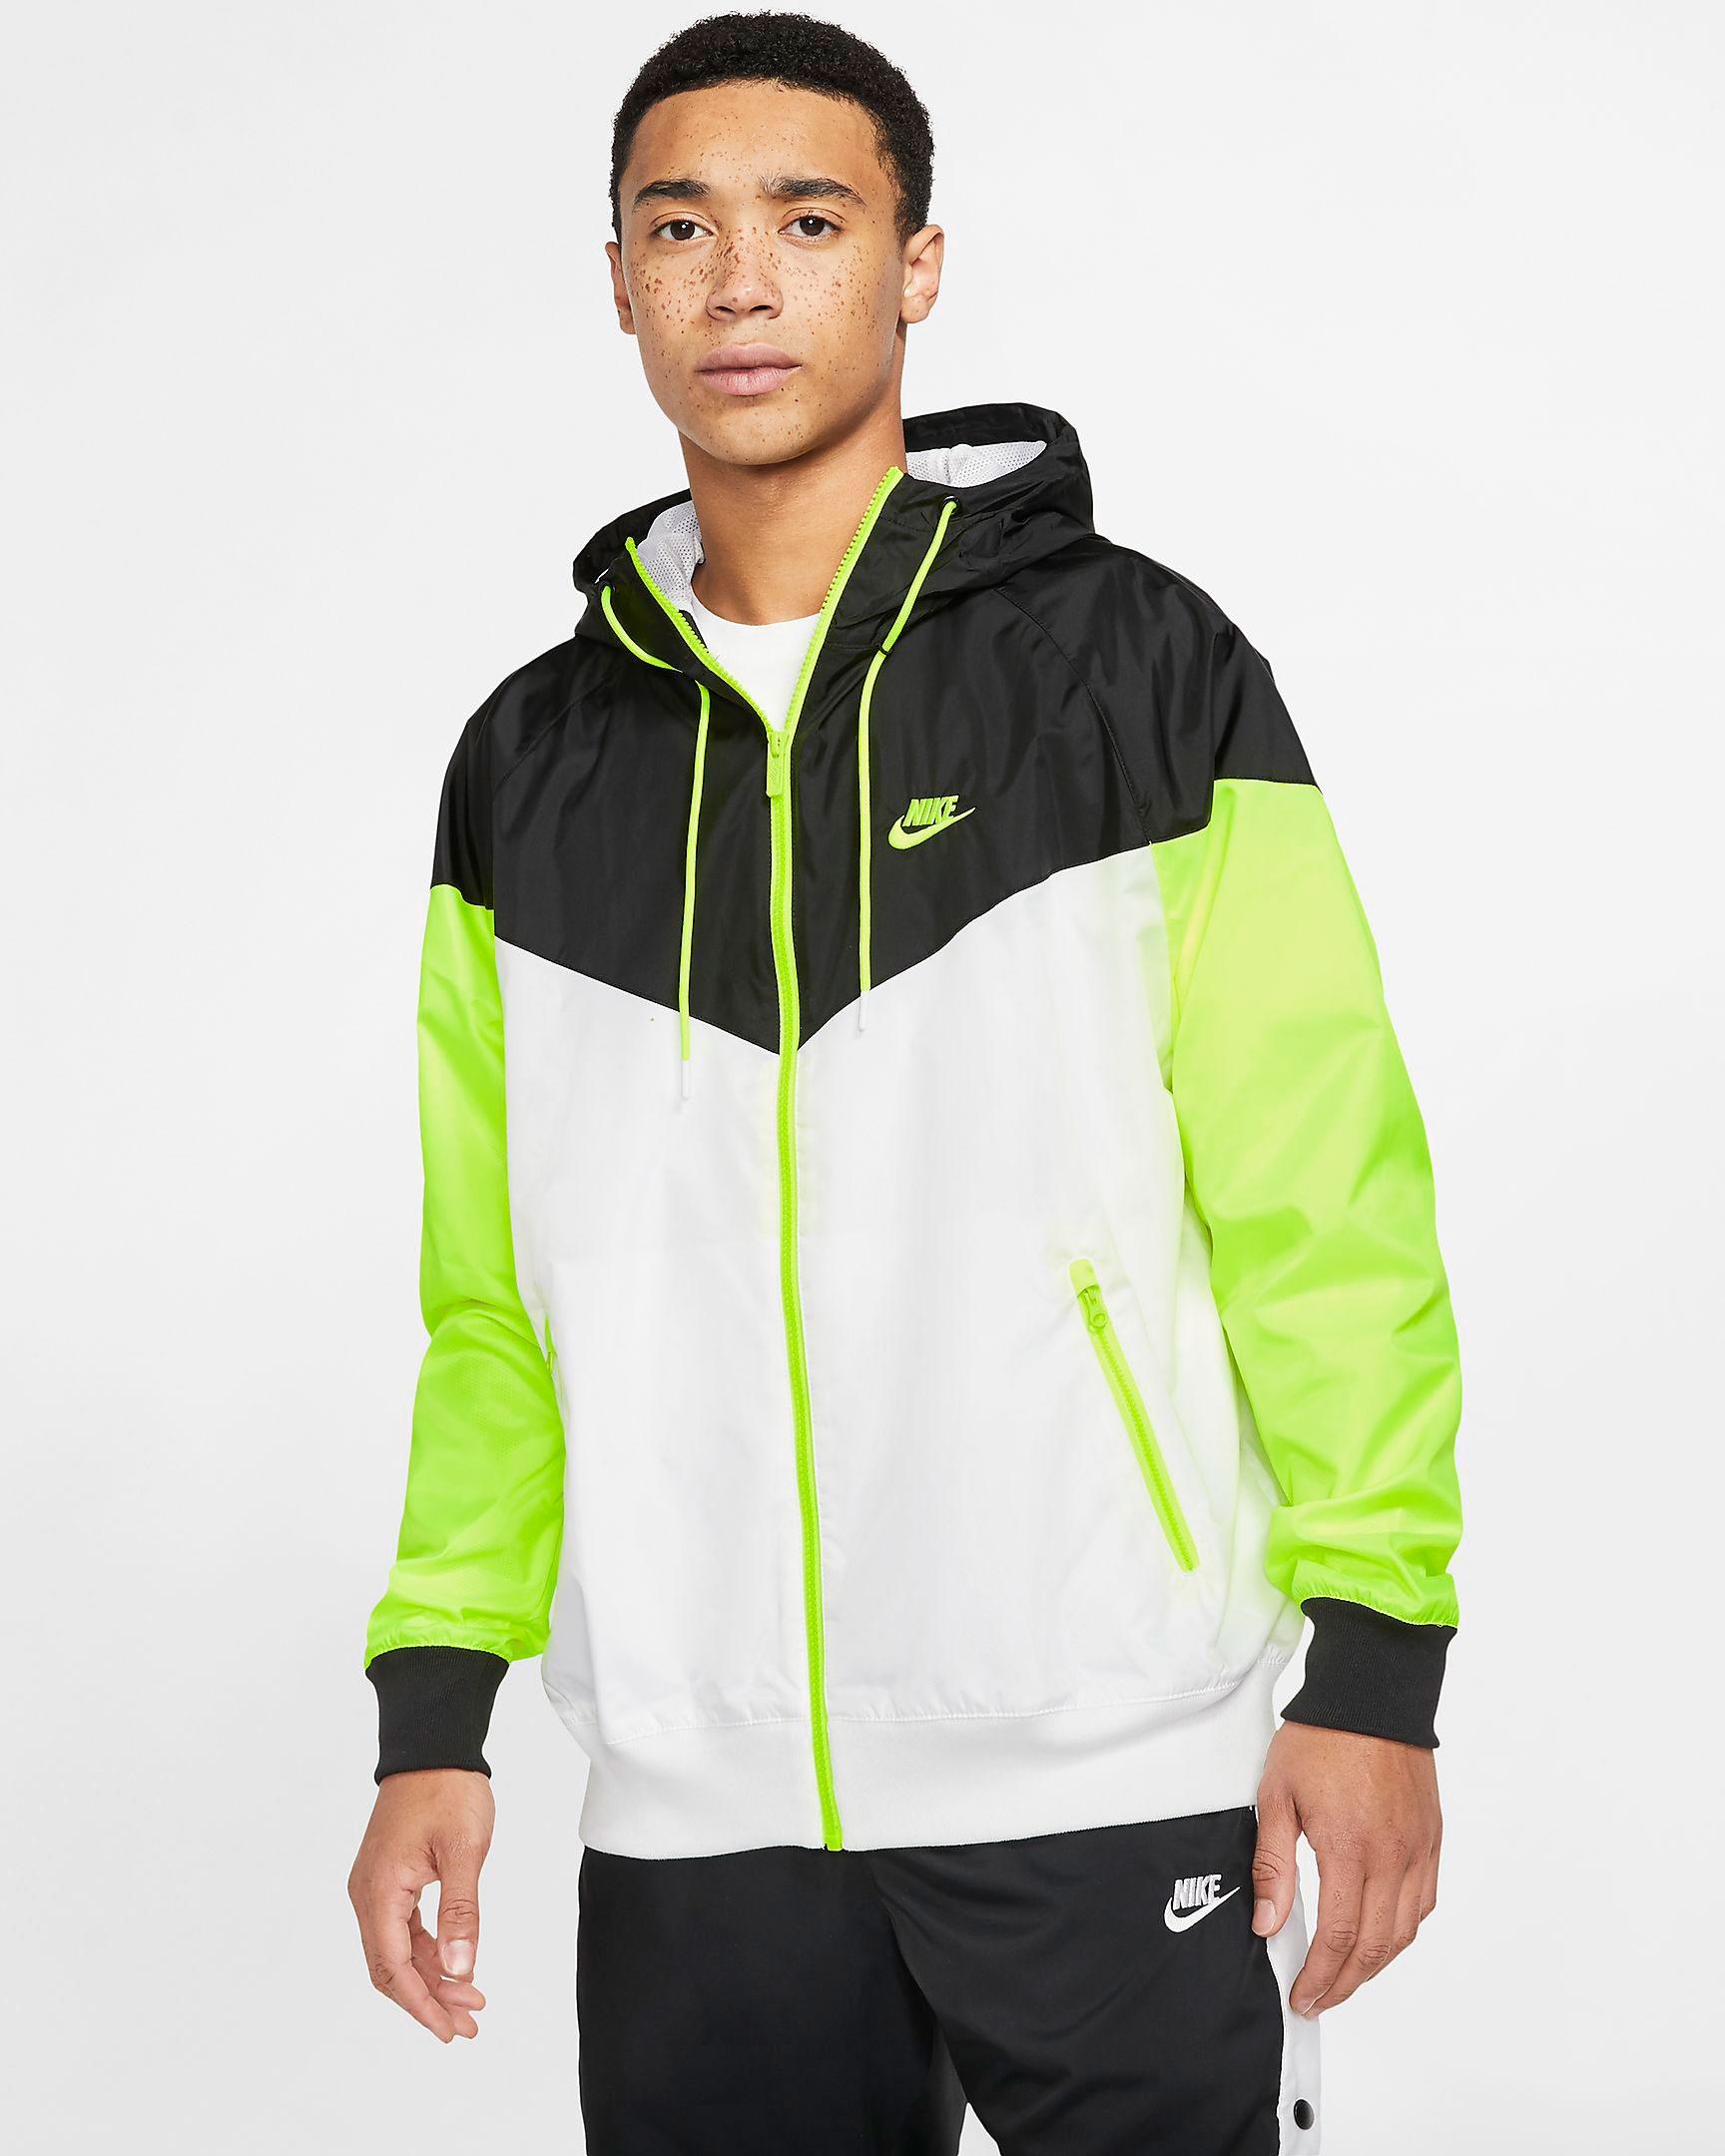 air-jordan-4-neon-volt-nike-jacket-match-1